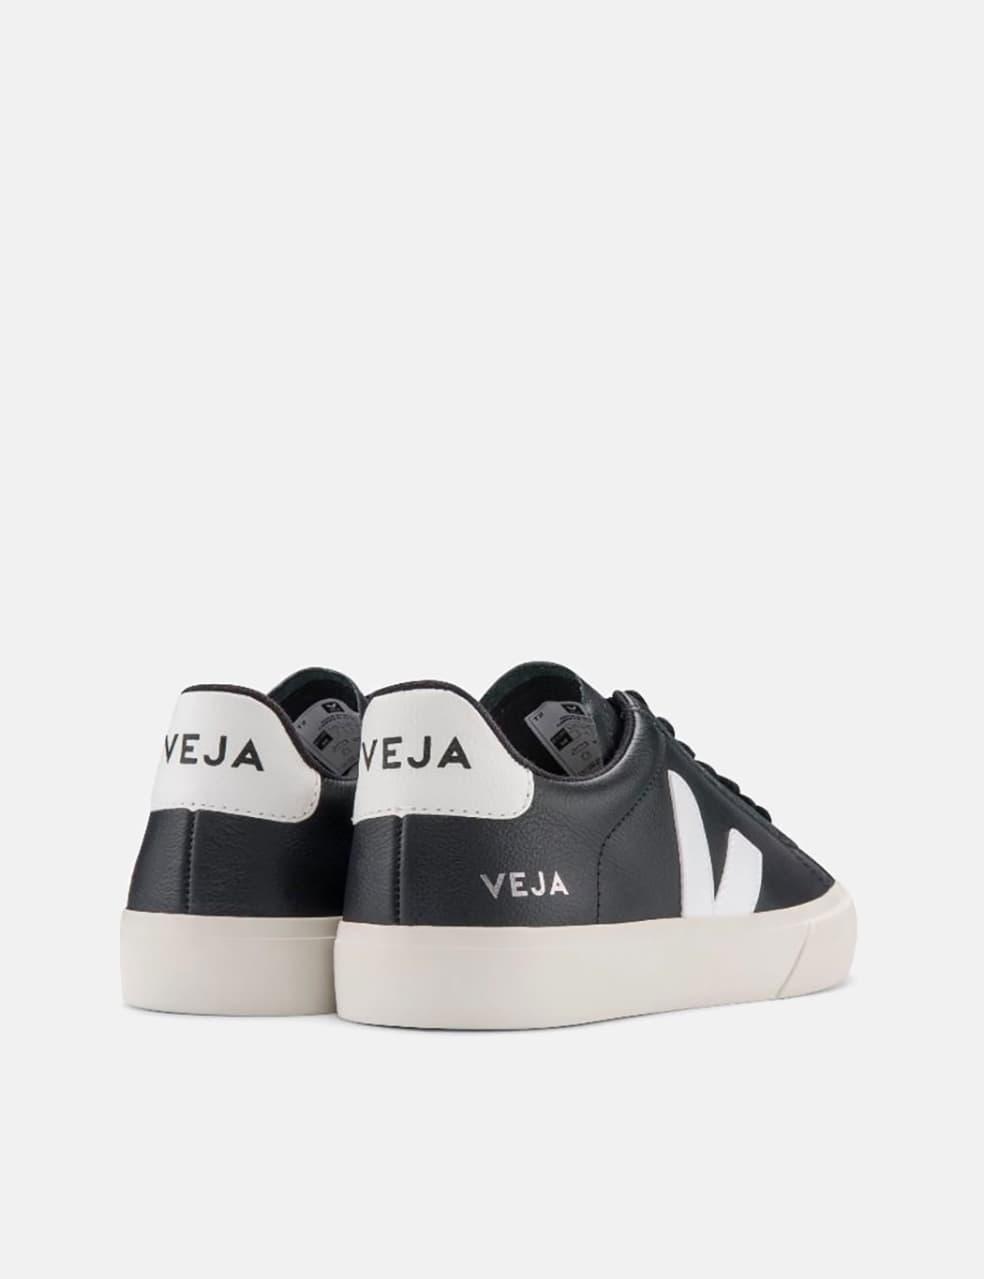 Womens Veja Campo Trainers (Chrome Free) - Black/White | Shoes by VEJA 3